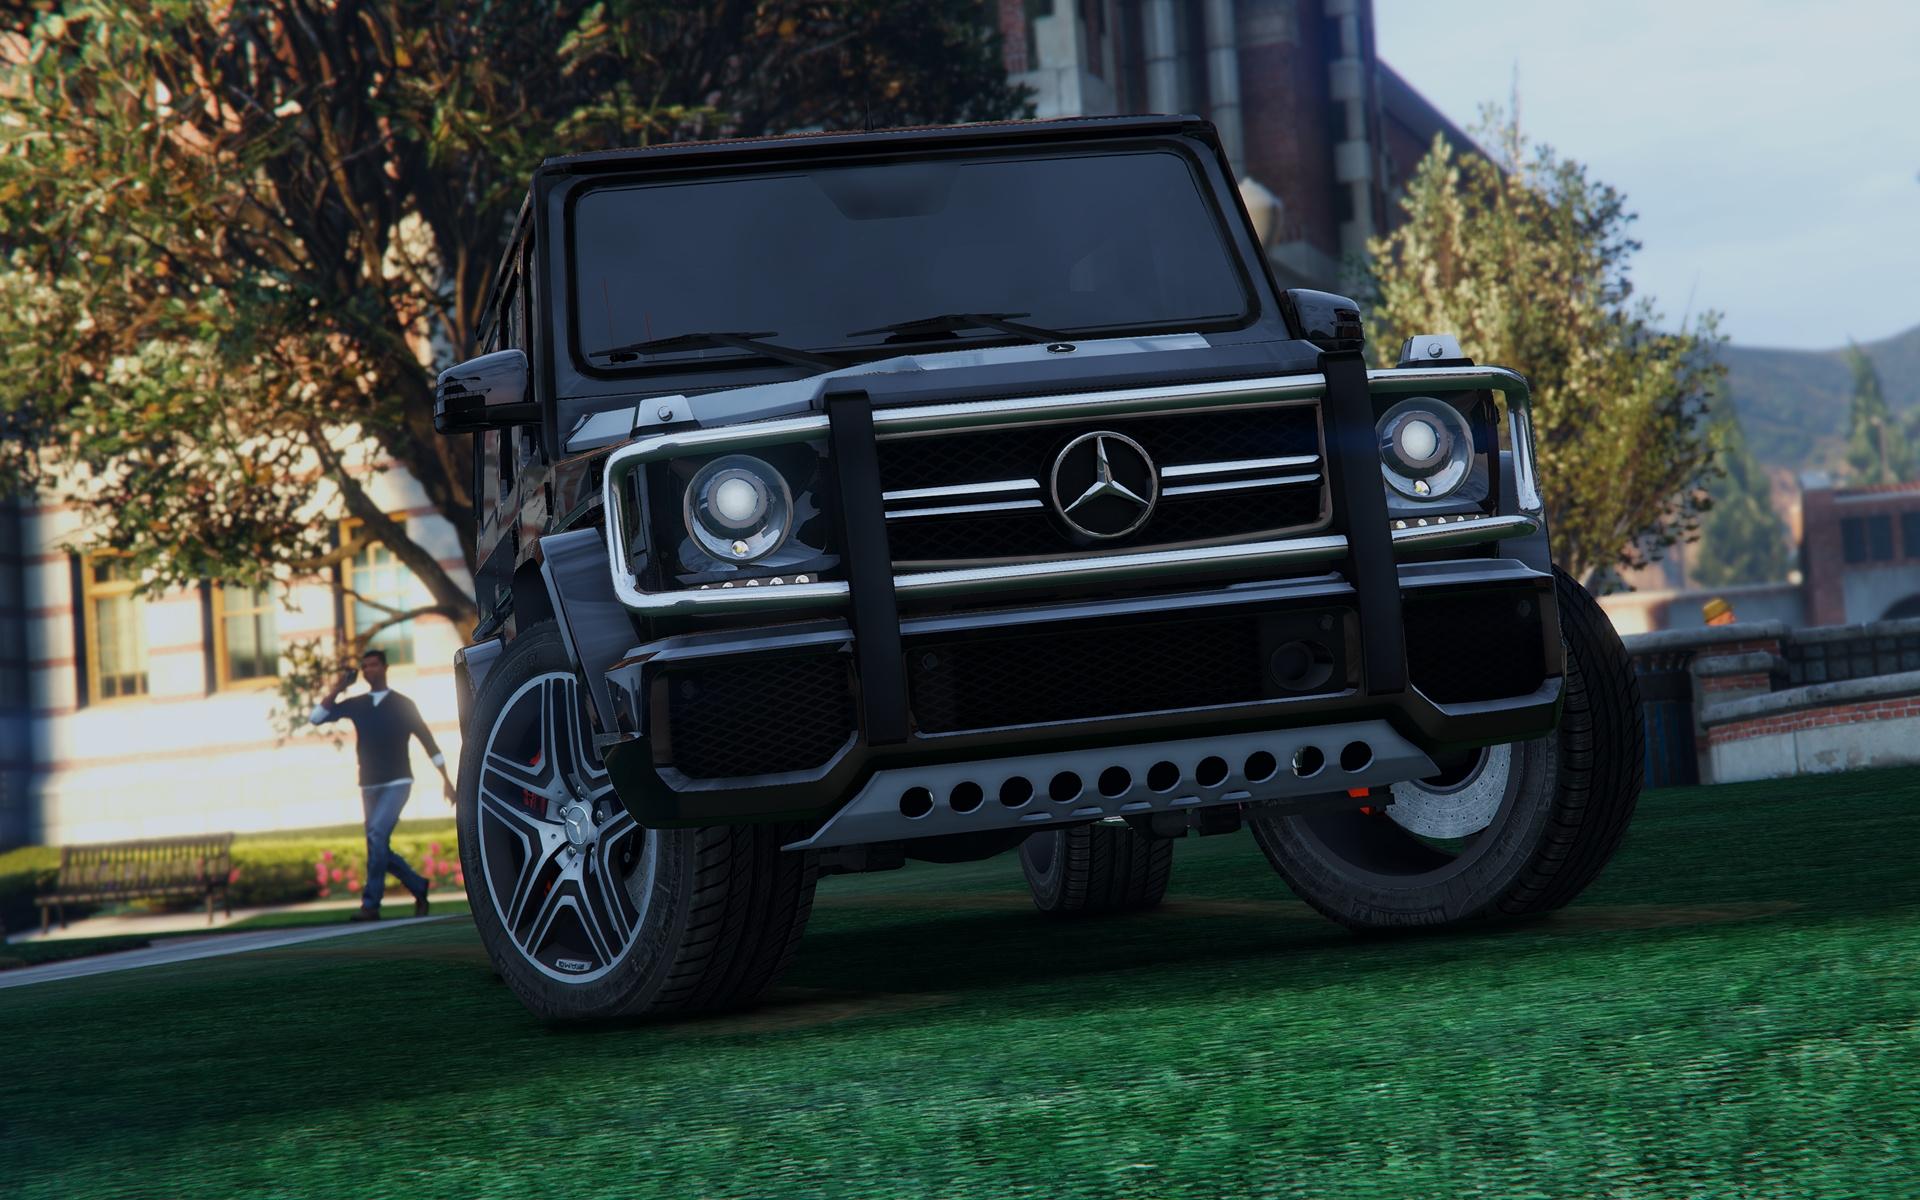 d7649a 0 167cee 2a16ce73 orig - Mercedes G65 Amg 66